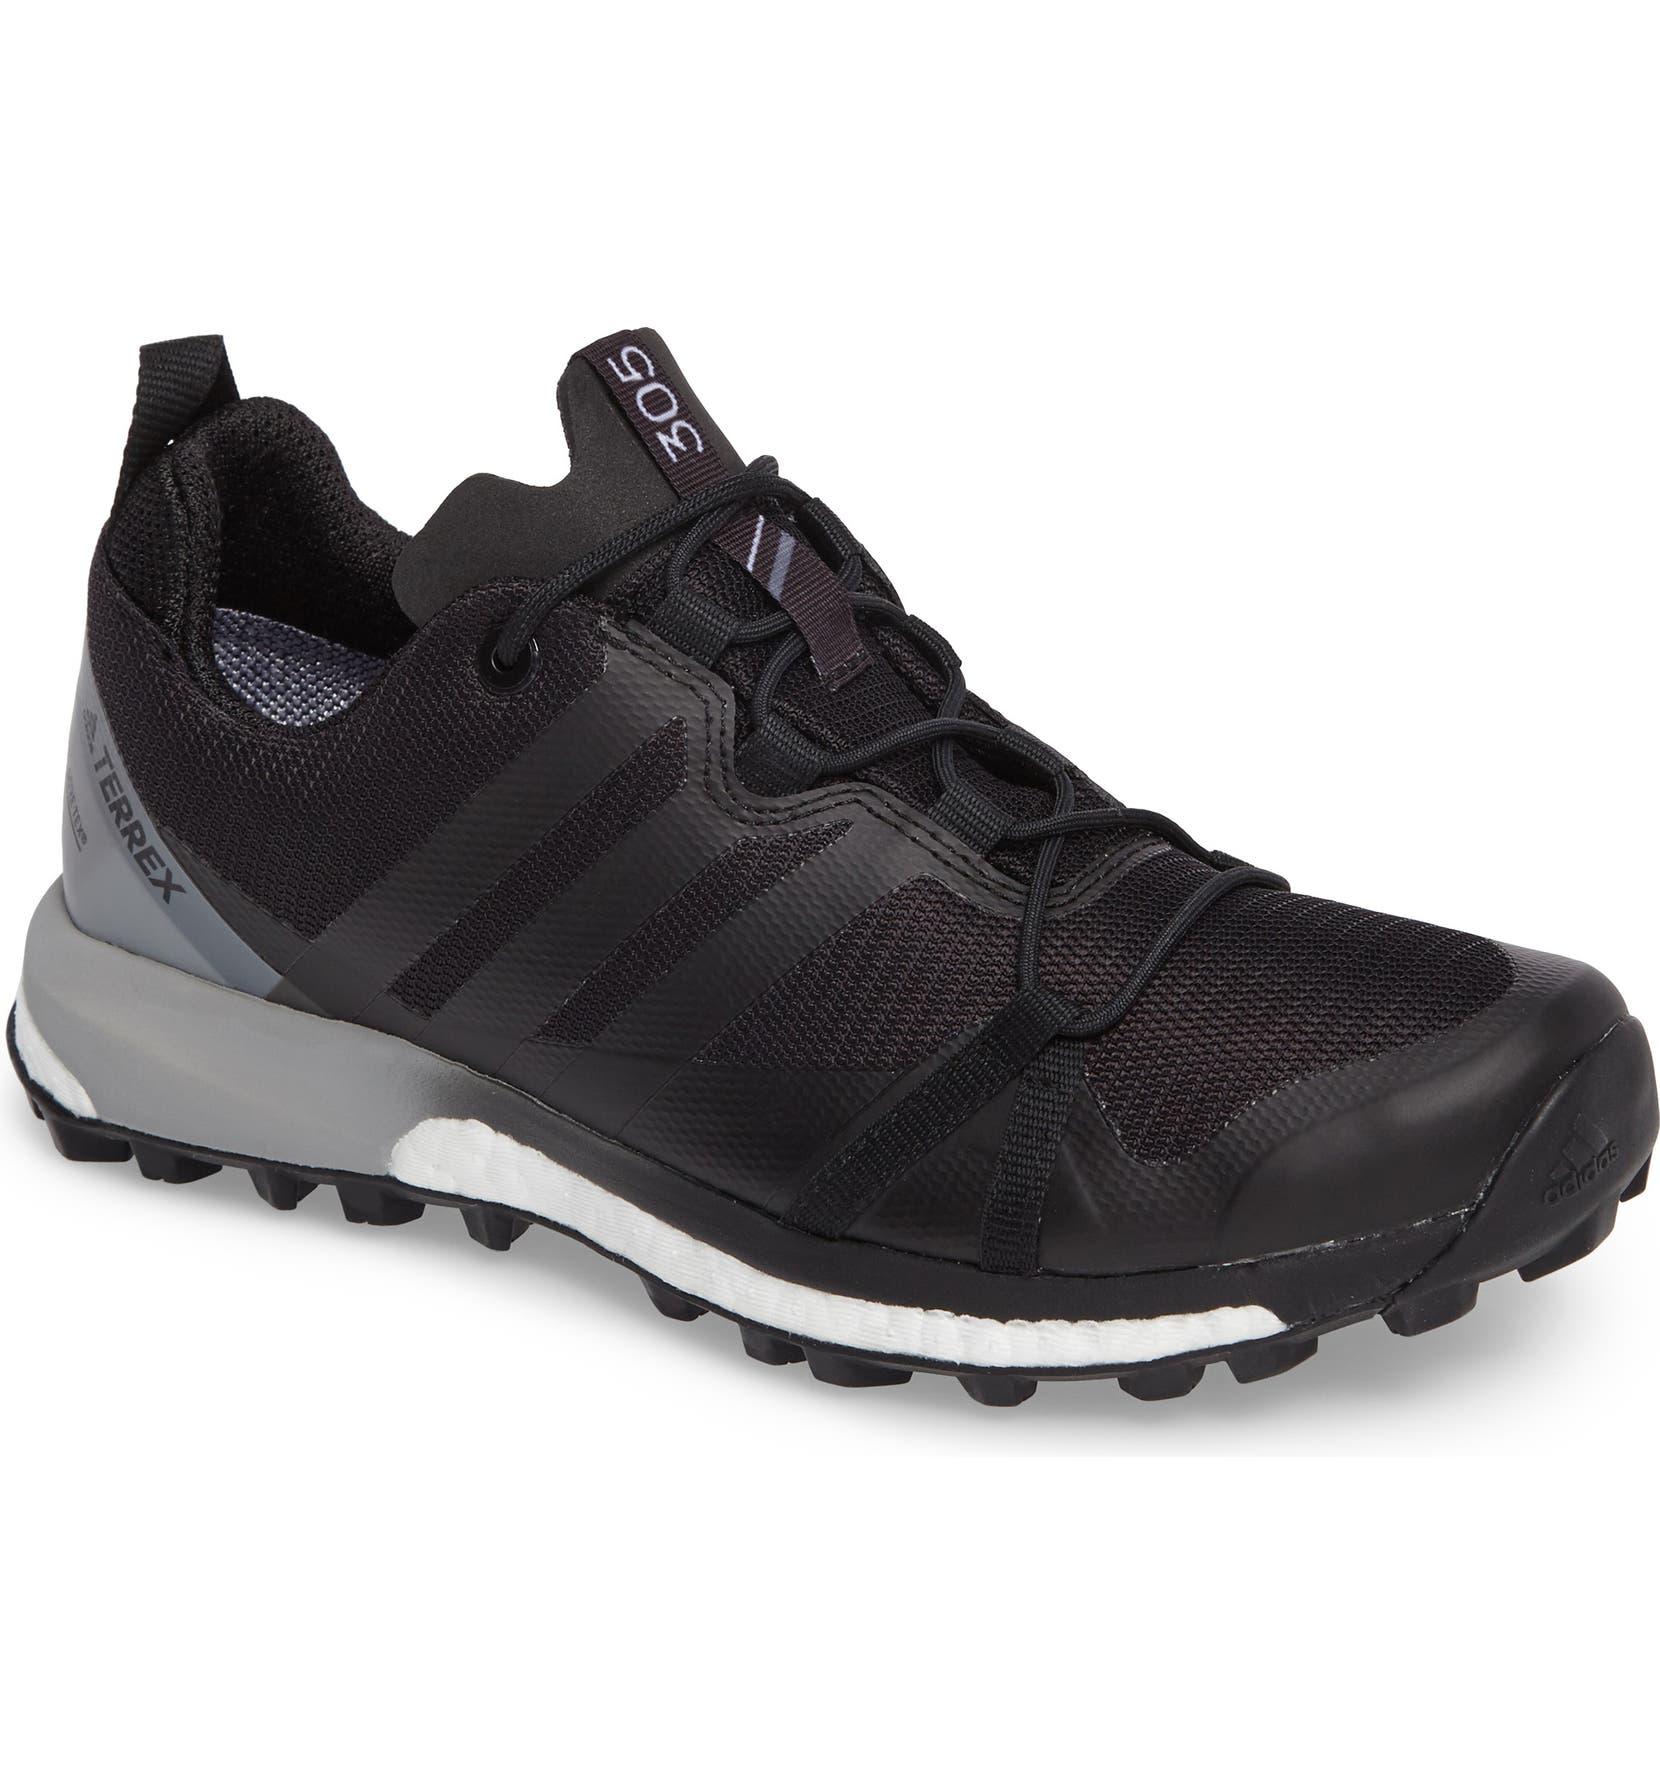 newest c44db 080ba adidas Terrex Agravic GTX Trail Shoe (Women)  Nordstrom